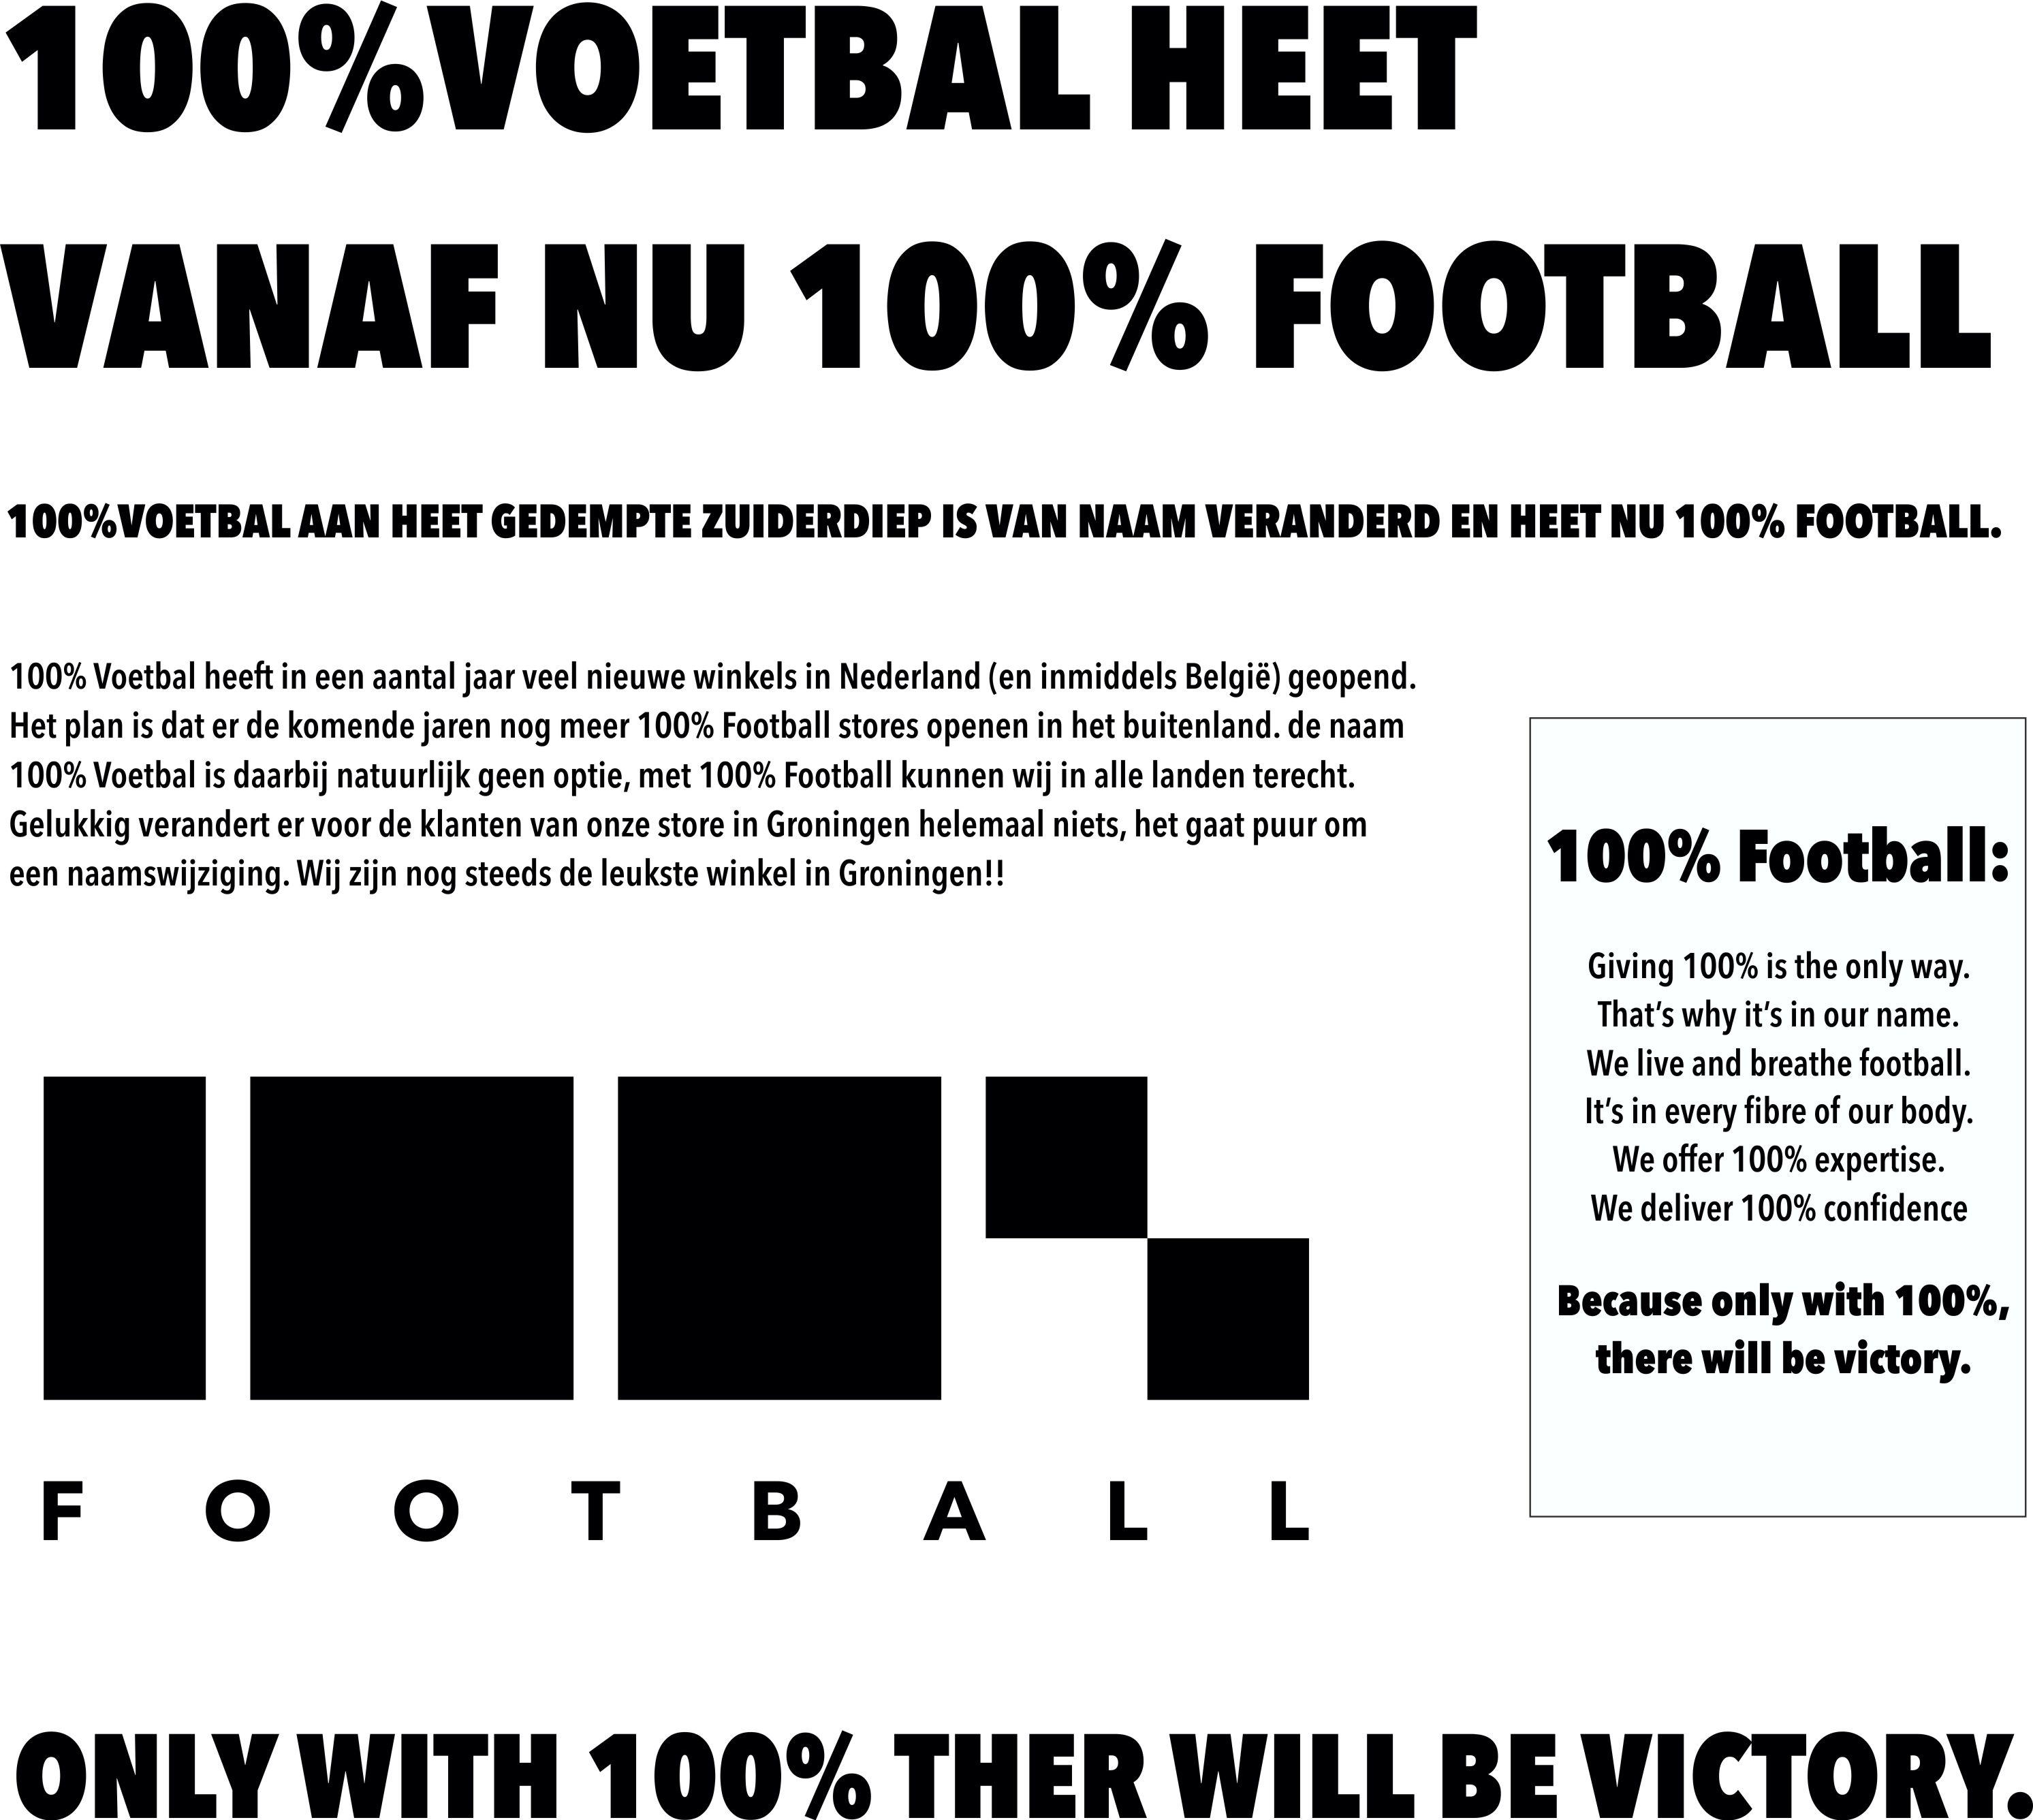 100%Football